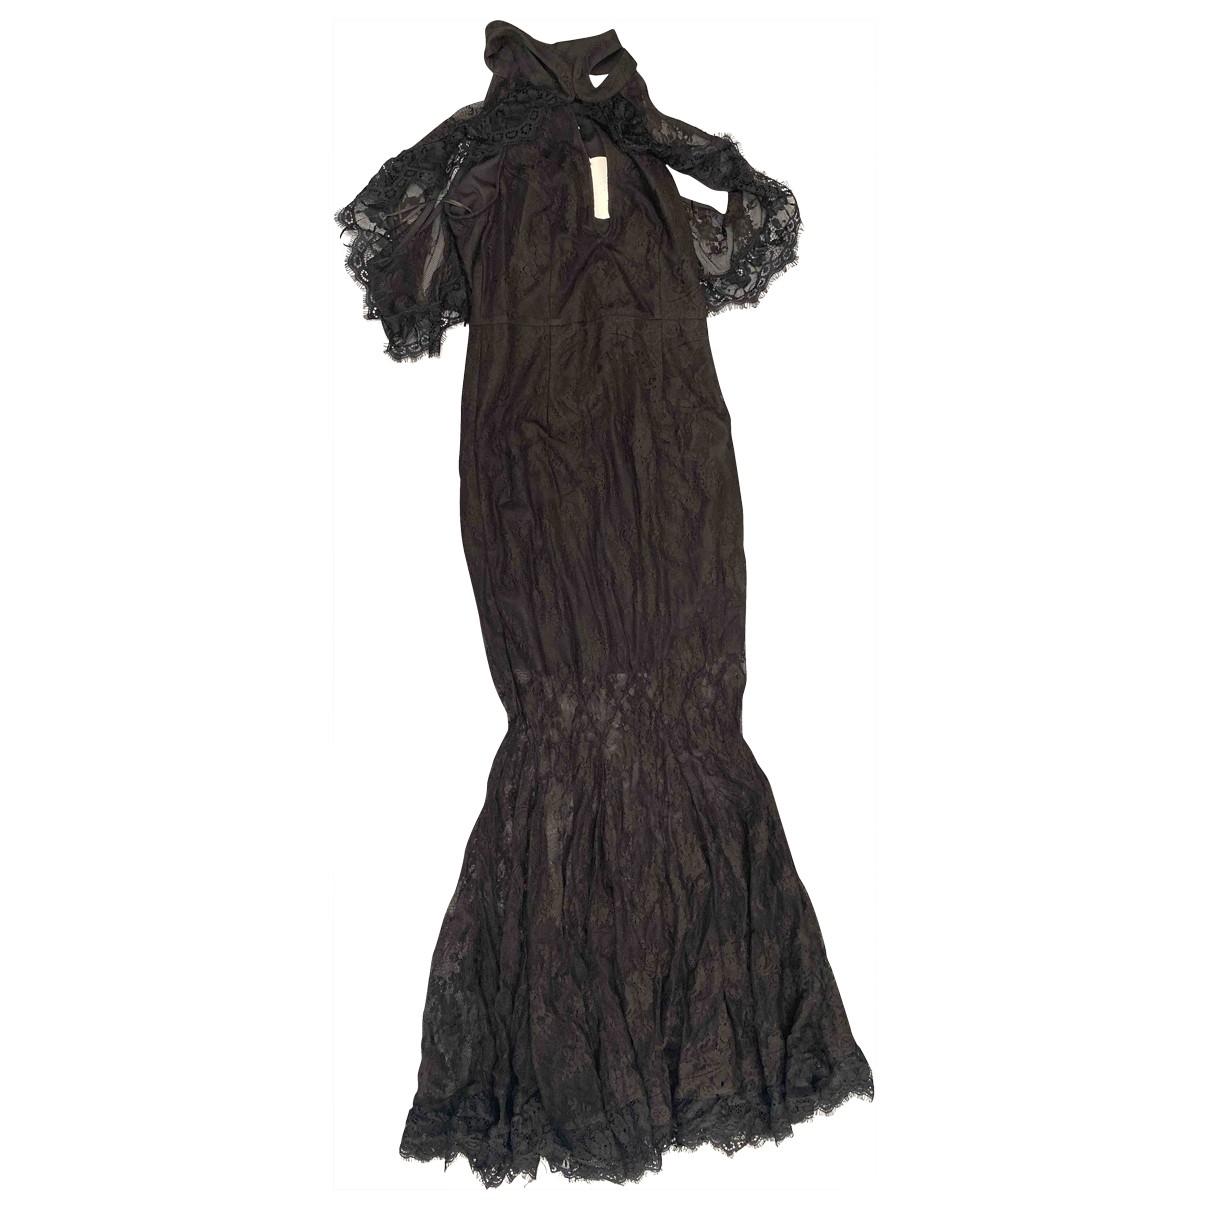 La Maison Talulah \N Black Cotton dress for Women S International